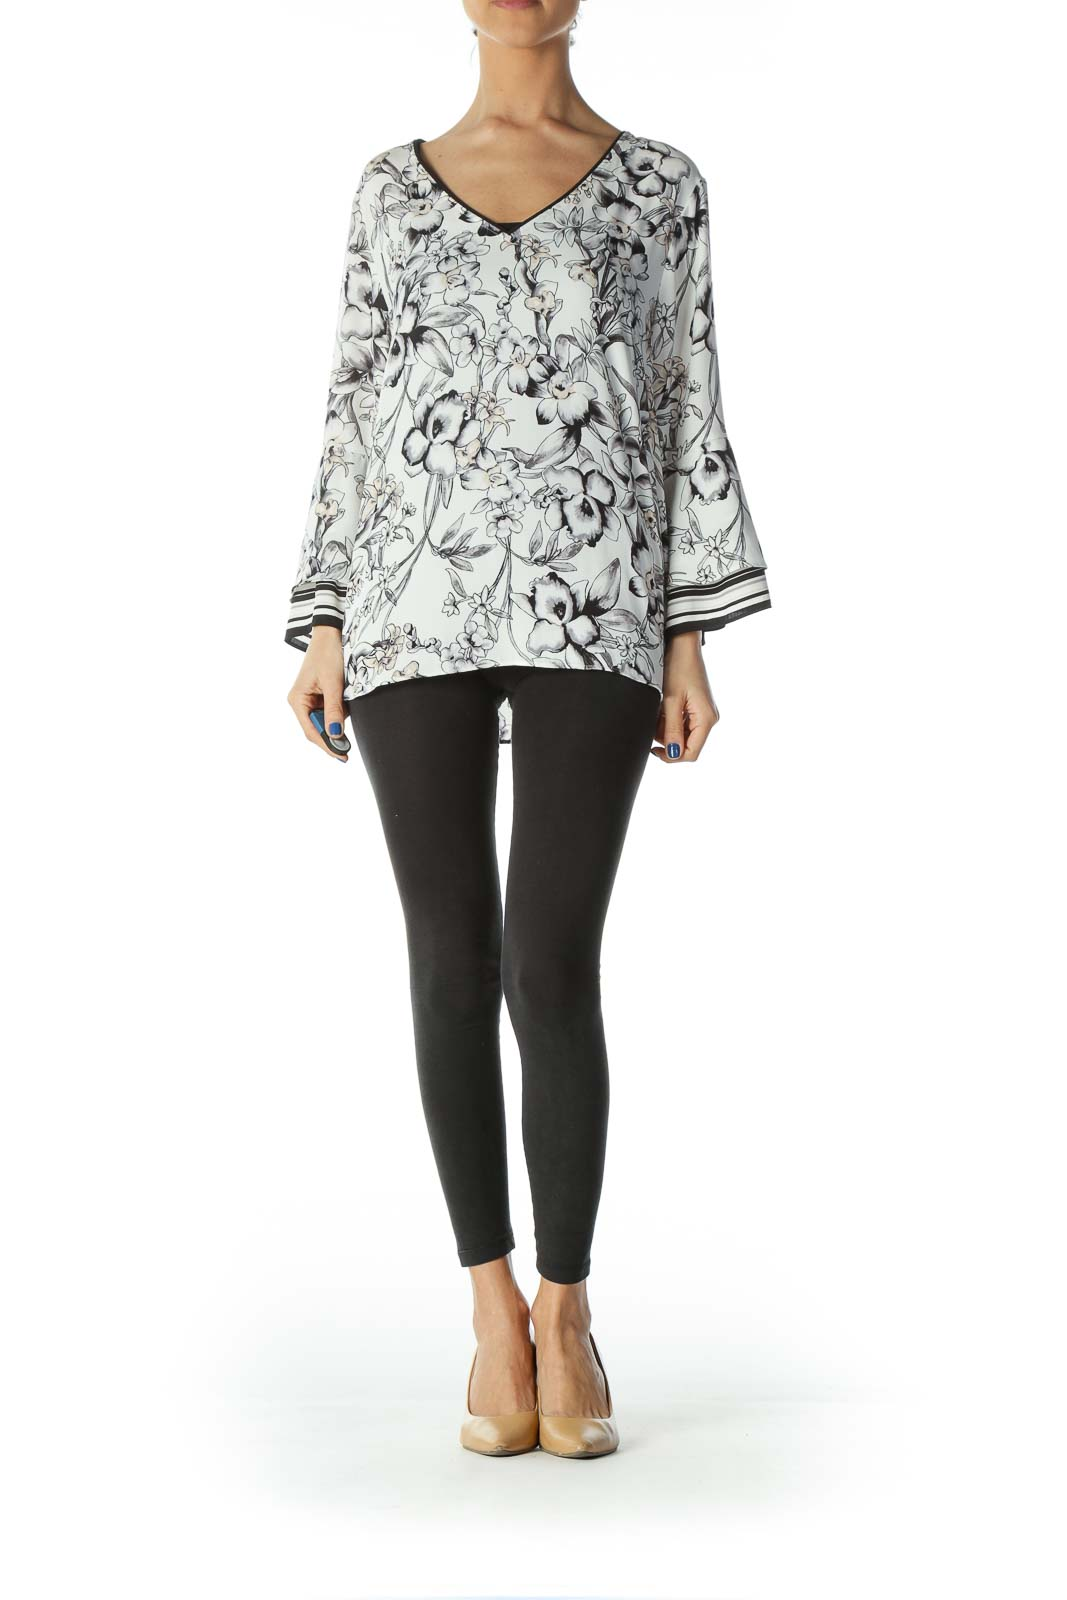 Black White Beige Floral Print Shift Blouse